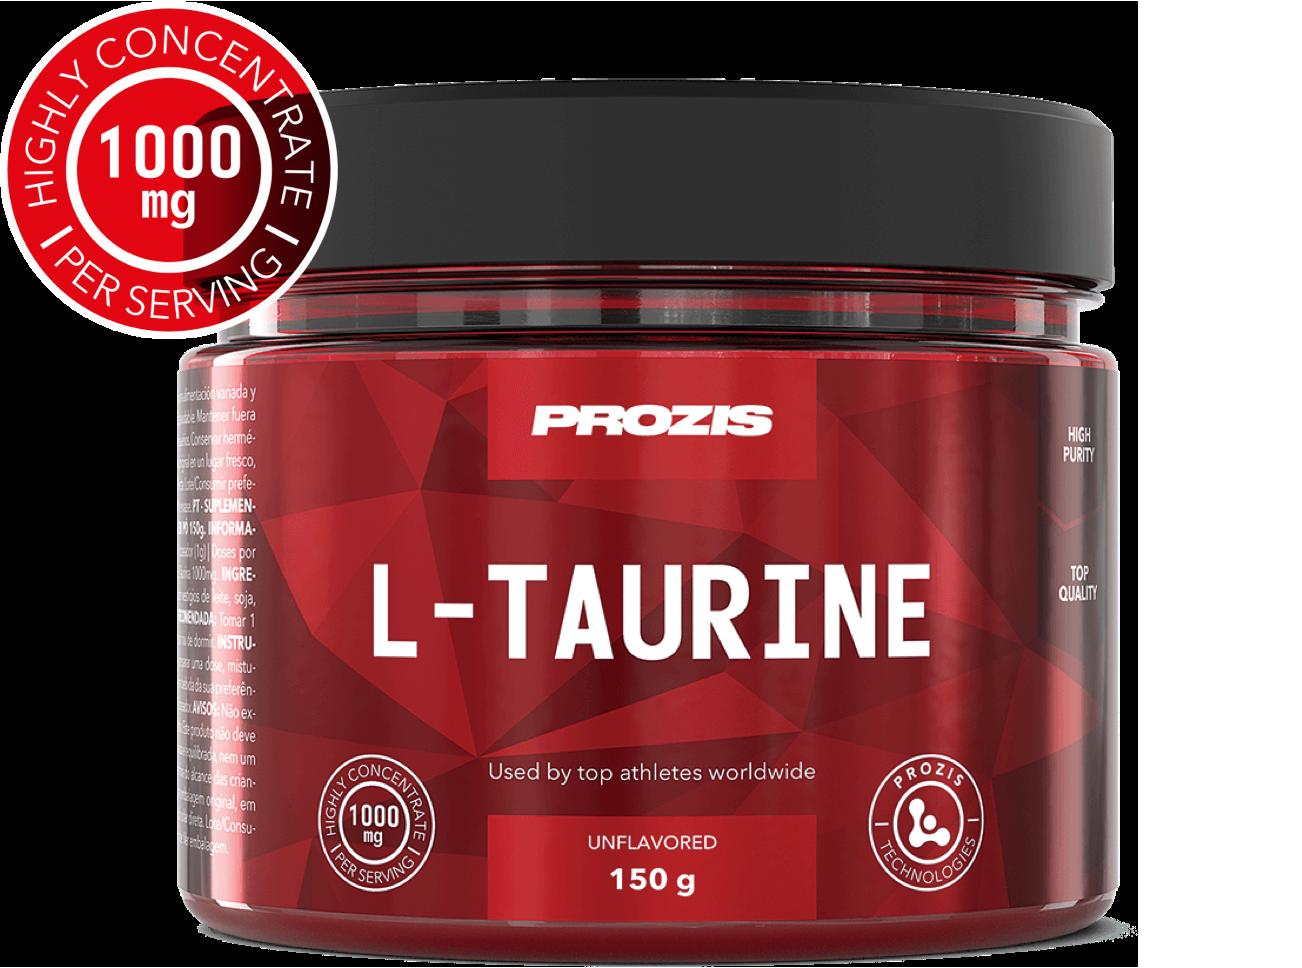 Prozis L-Taurine 150g